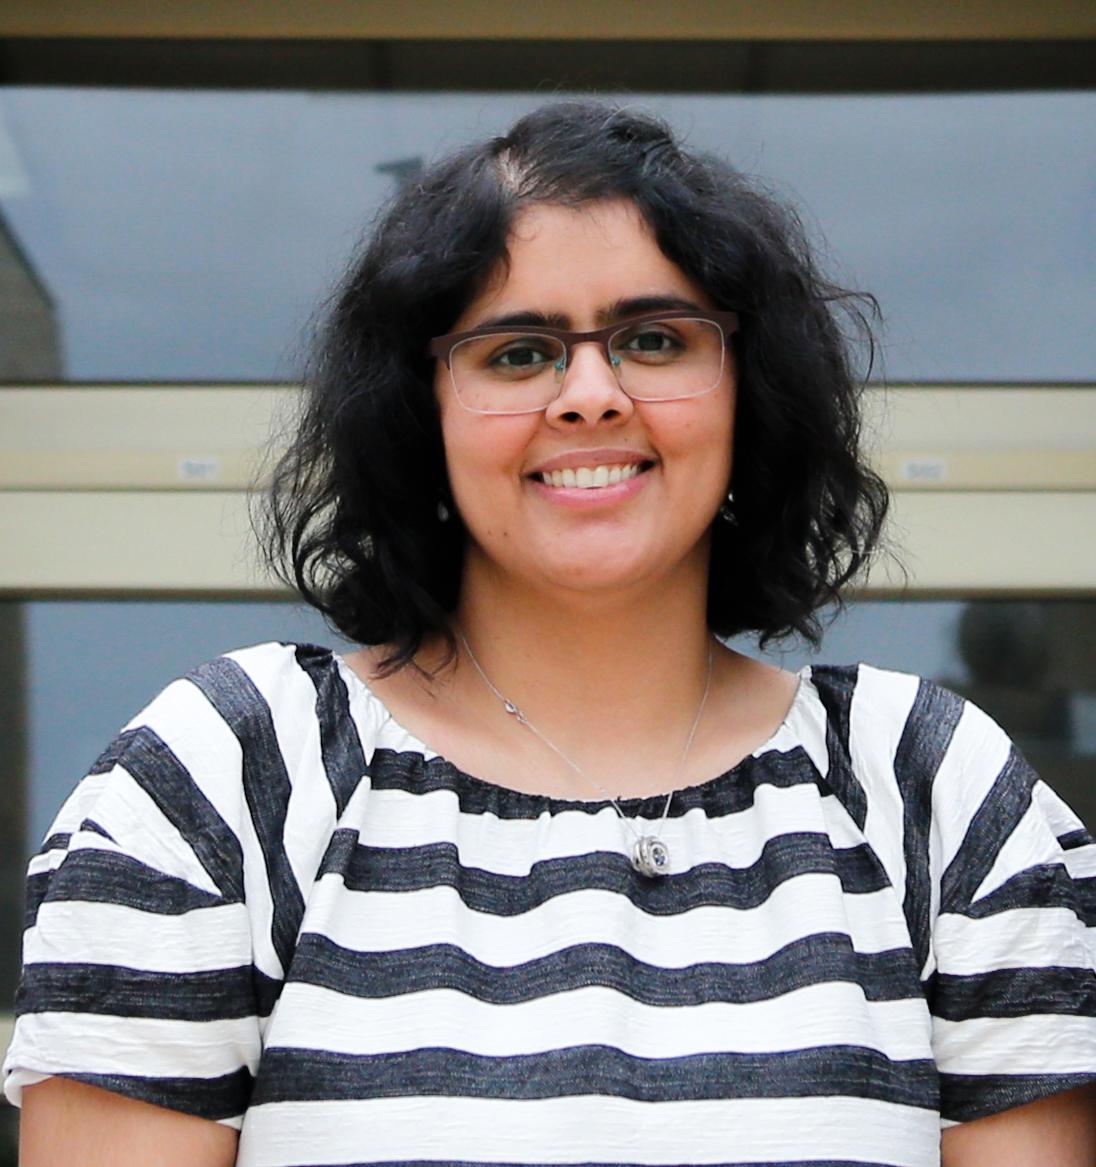 Mrinalini Hoon smiling into the camera wearing a striped shirt.